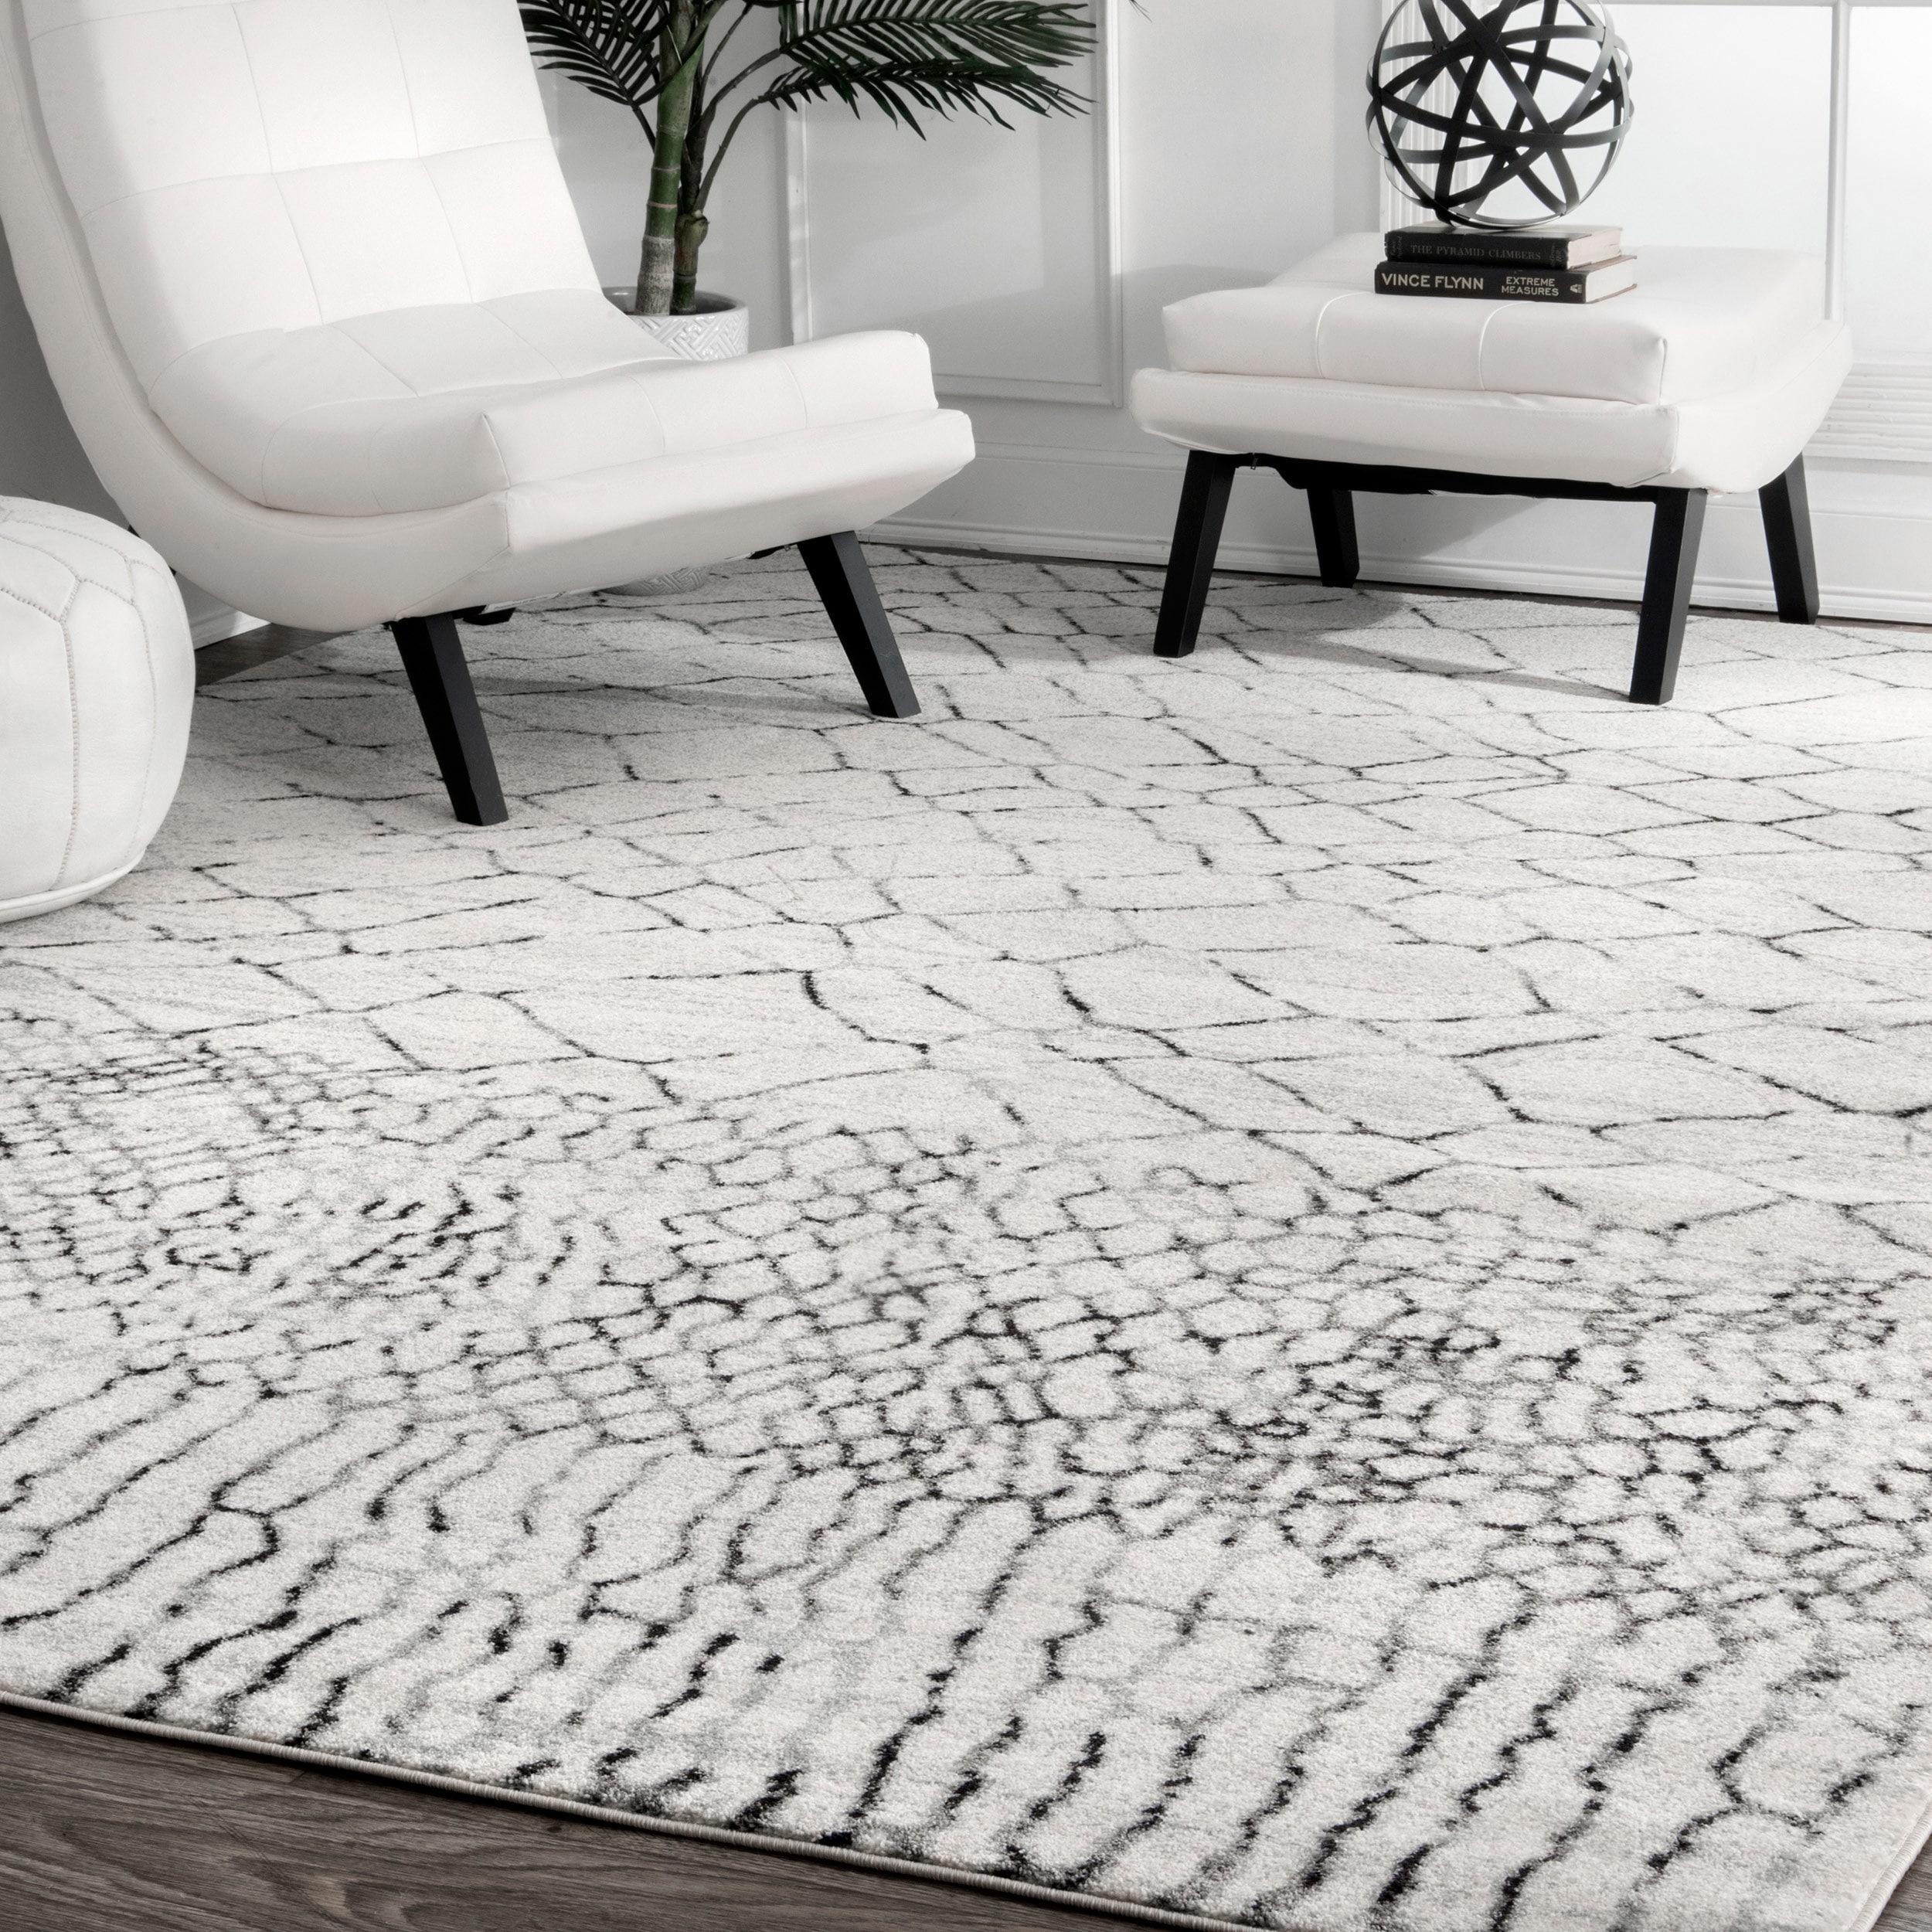 Rugs Grey Geometric Moroccan Tile Living Room Rugs Ivory